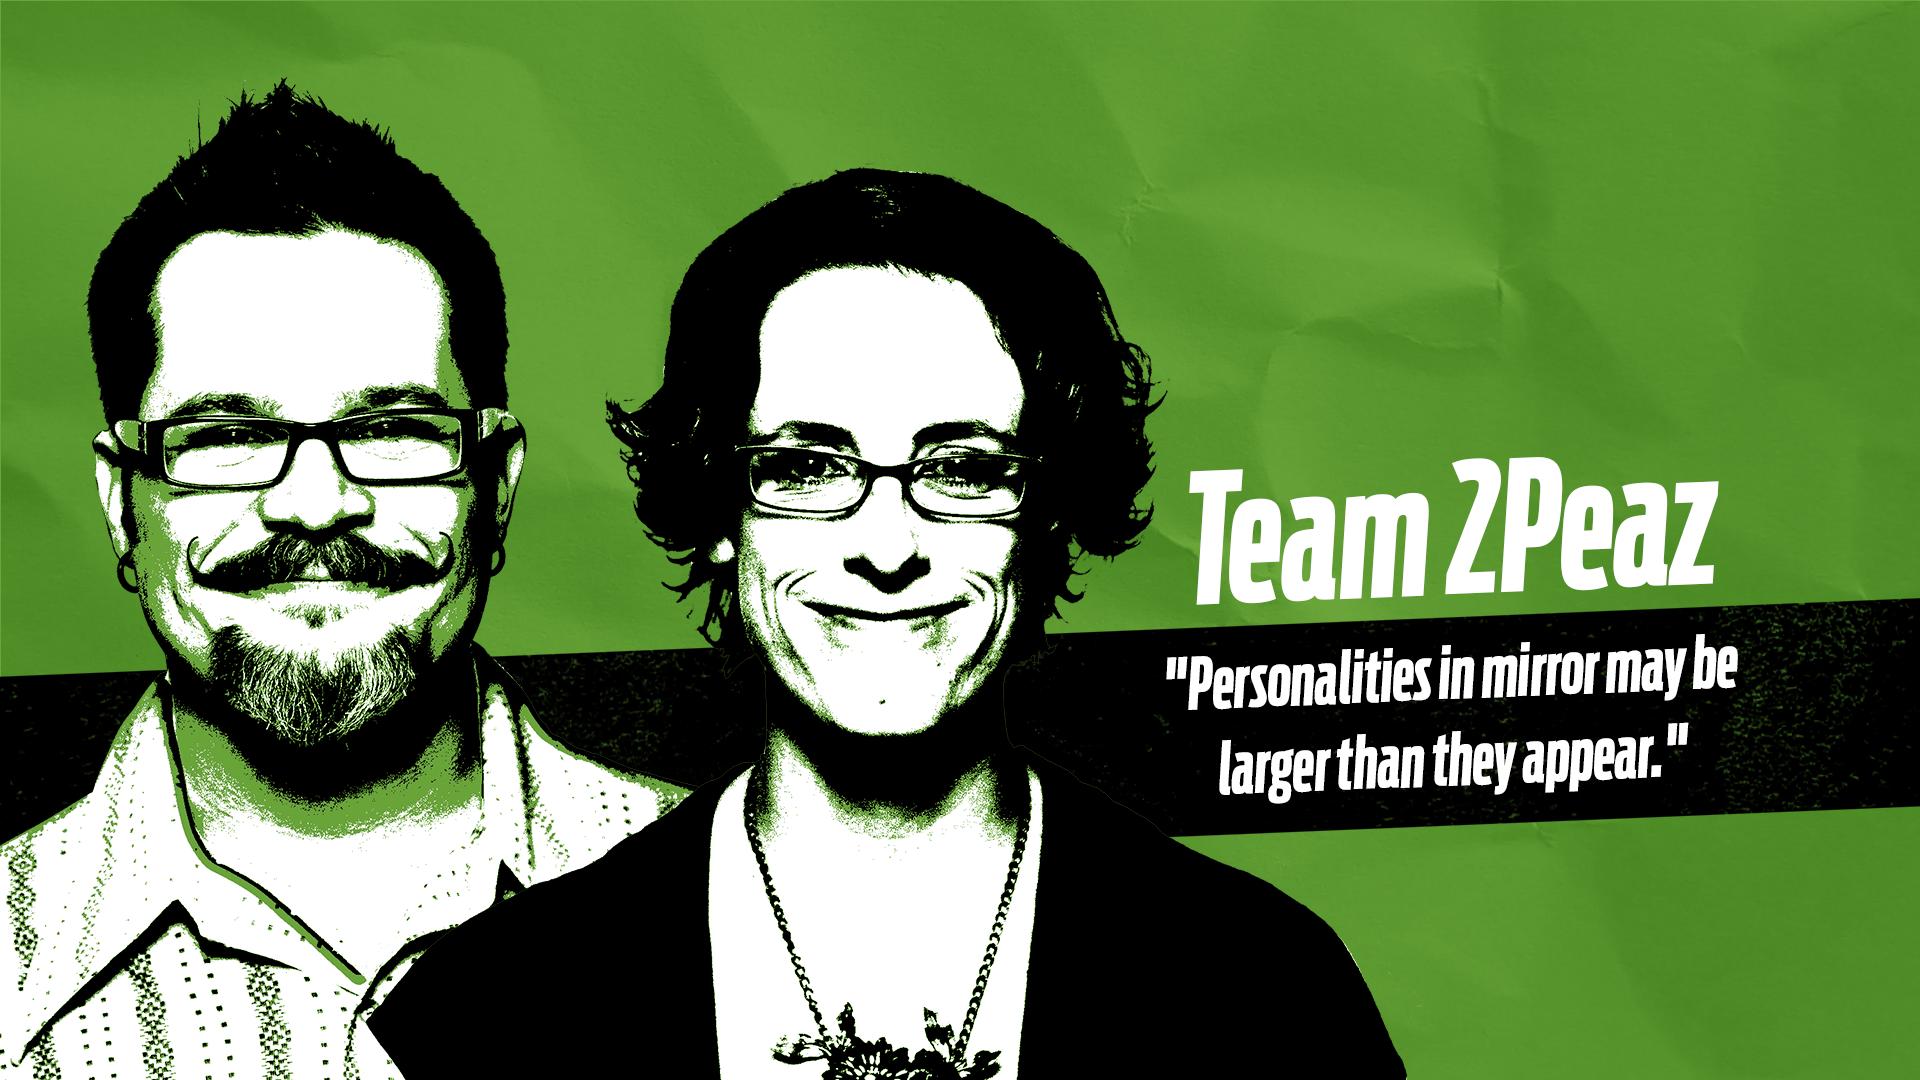 Namecard Team 2Peaz